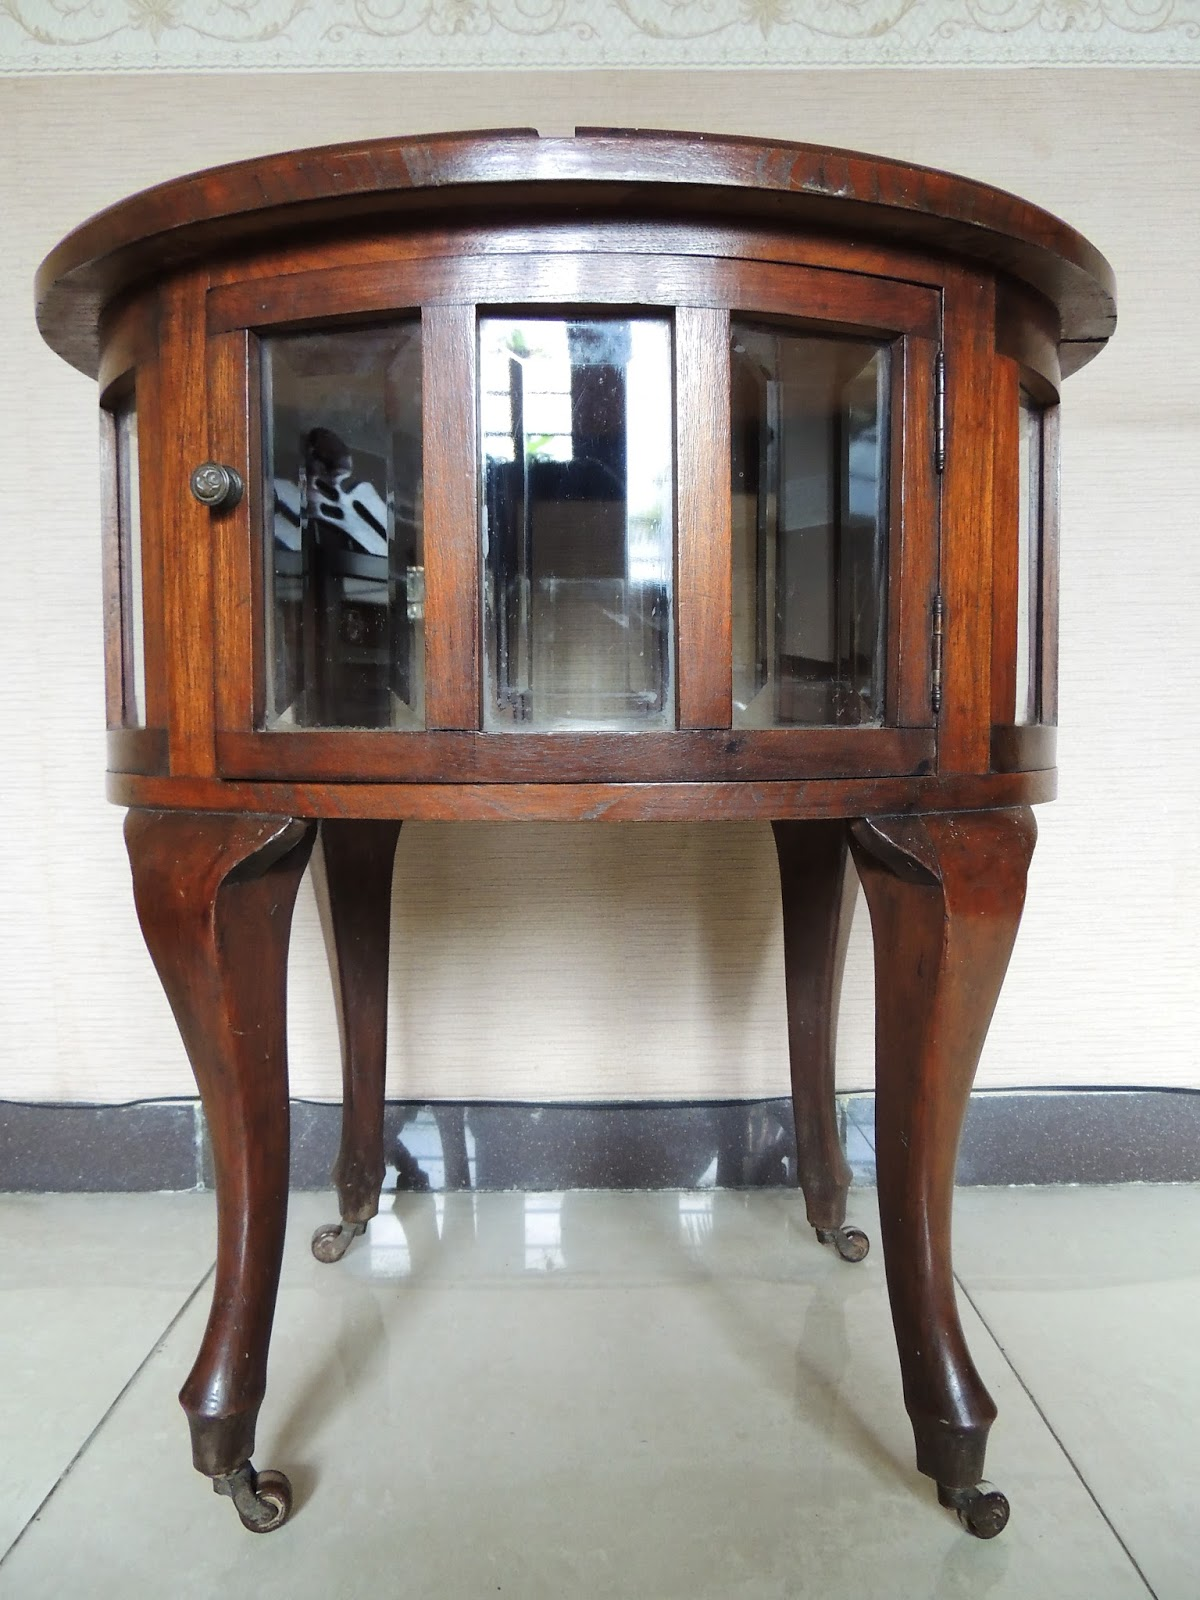 Henry Antique Collections Antique Tea Cabinet